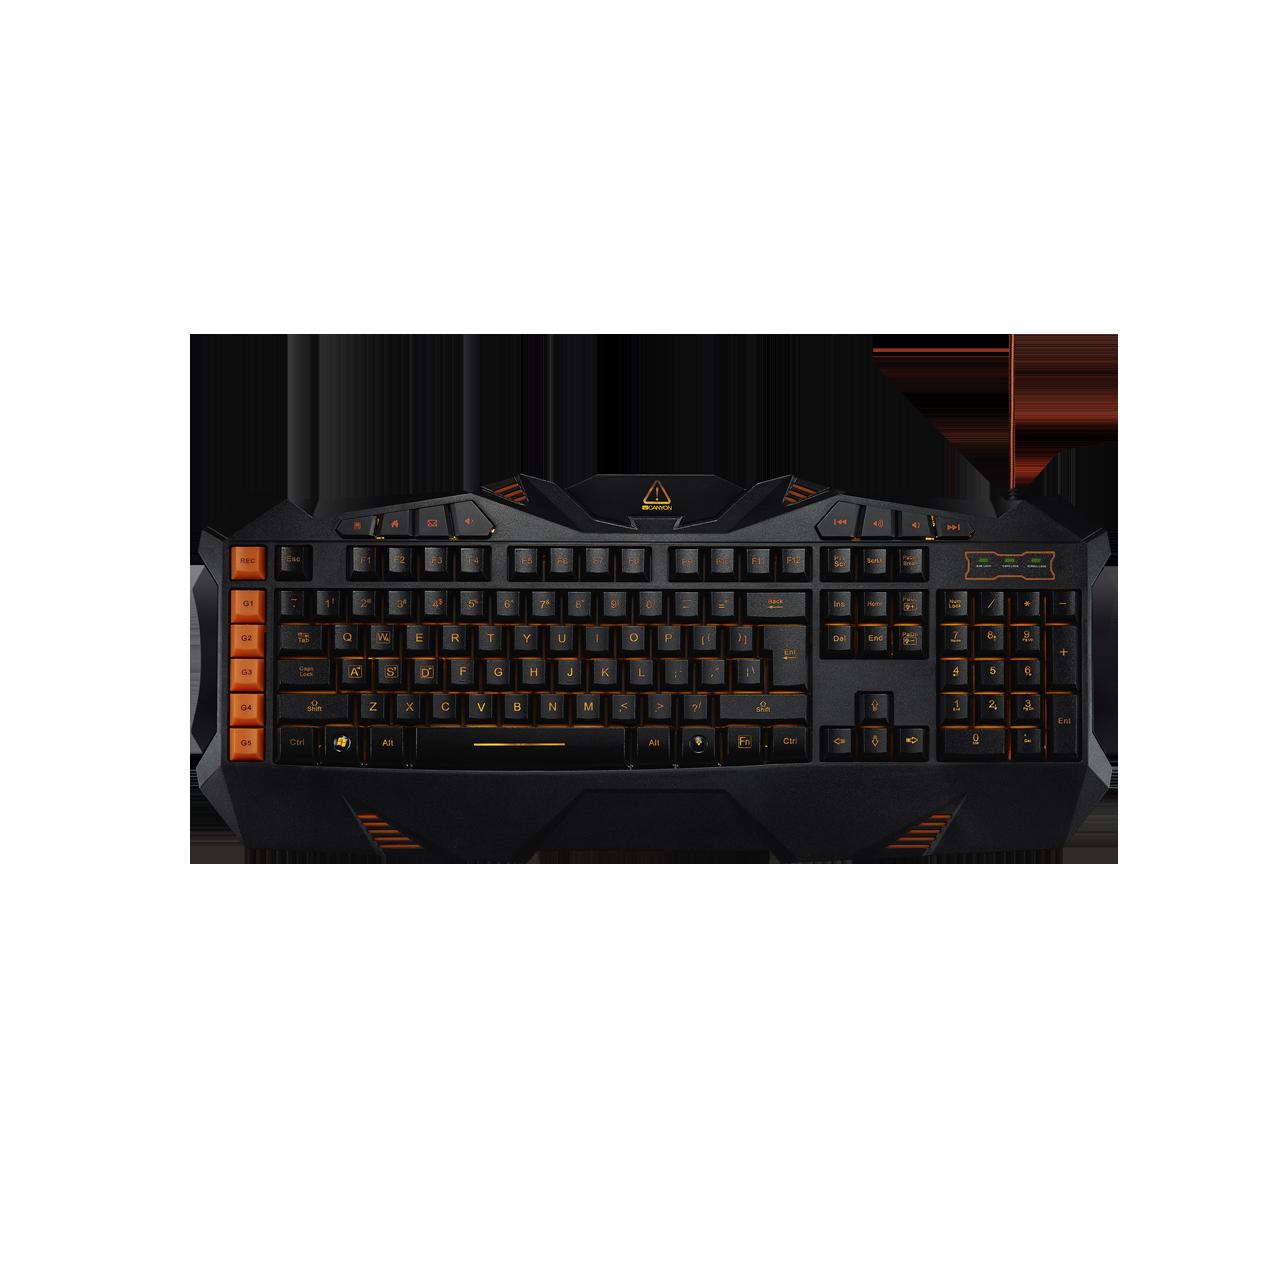 Canyon Gaming Keyboard with Macro Function